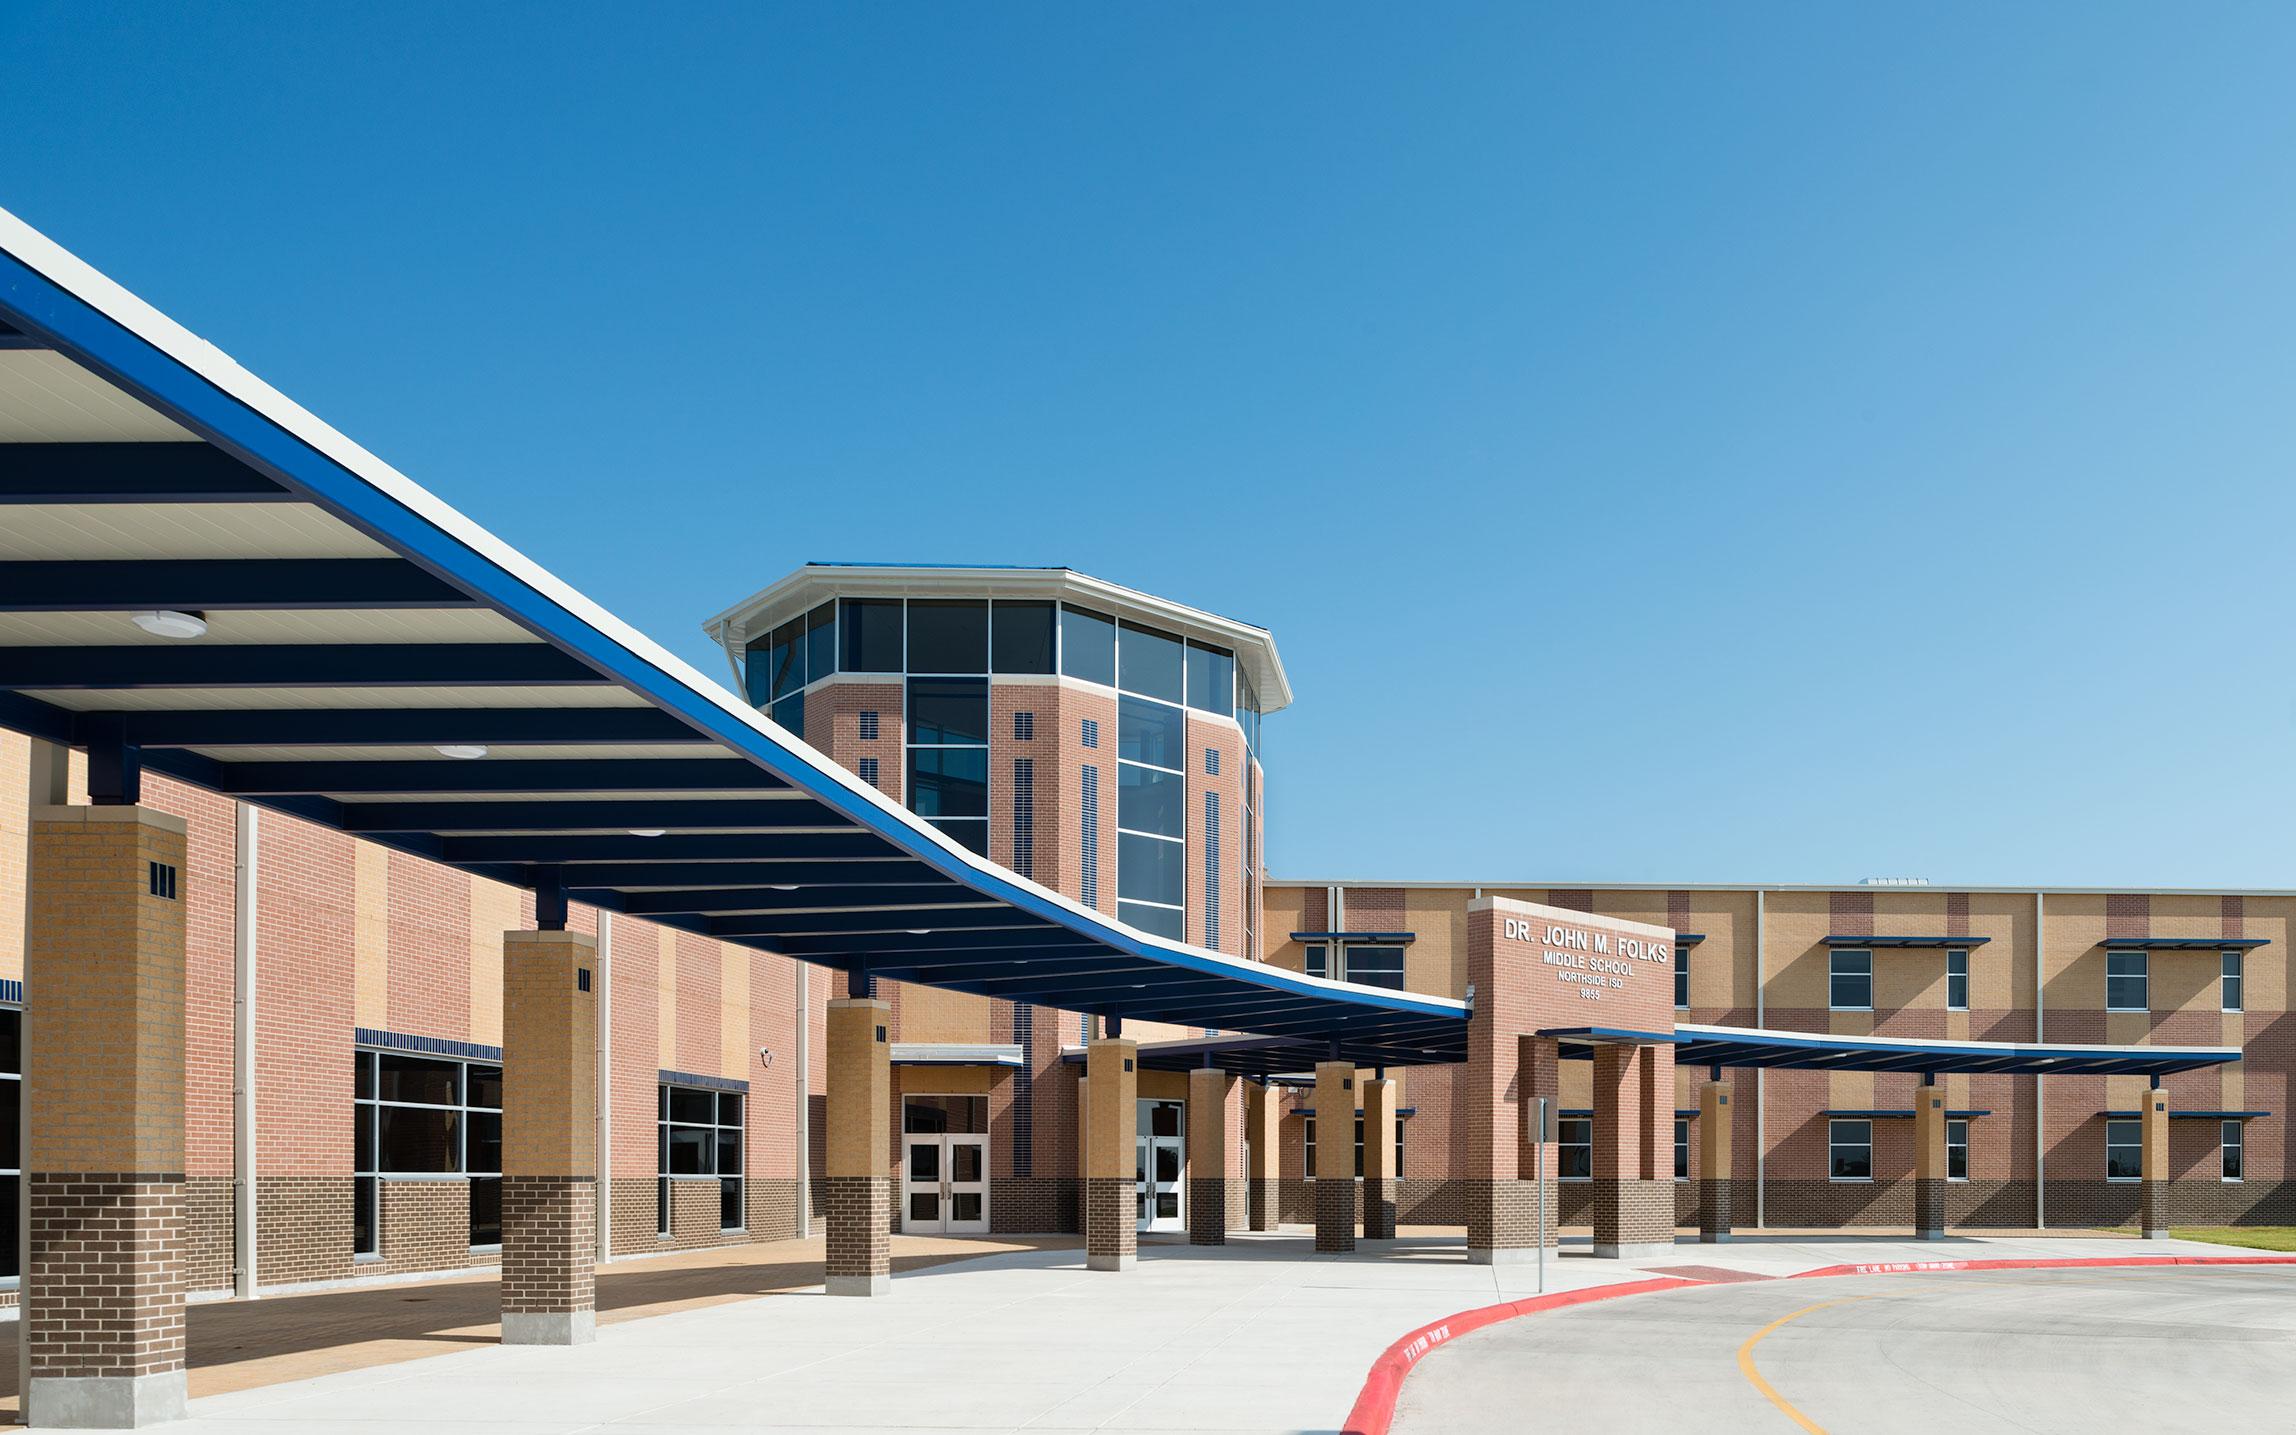 Dr John M Folks Middle School  Northside ISD  Marmon